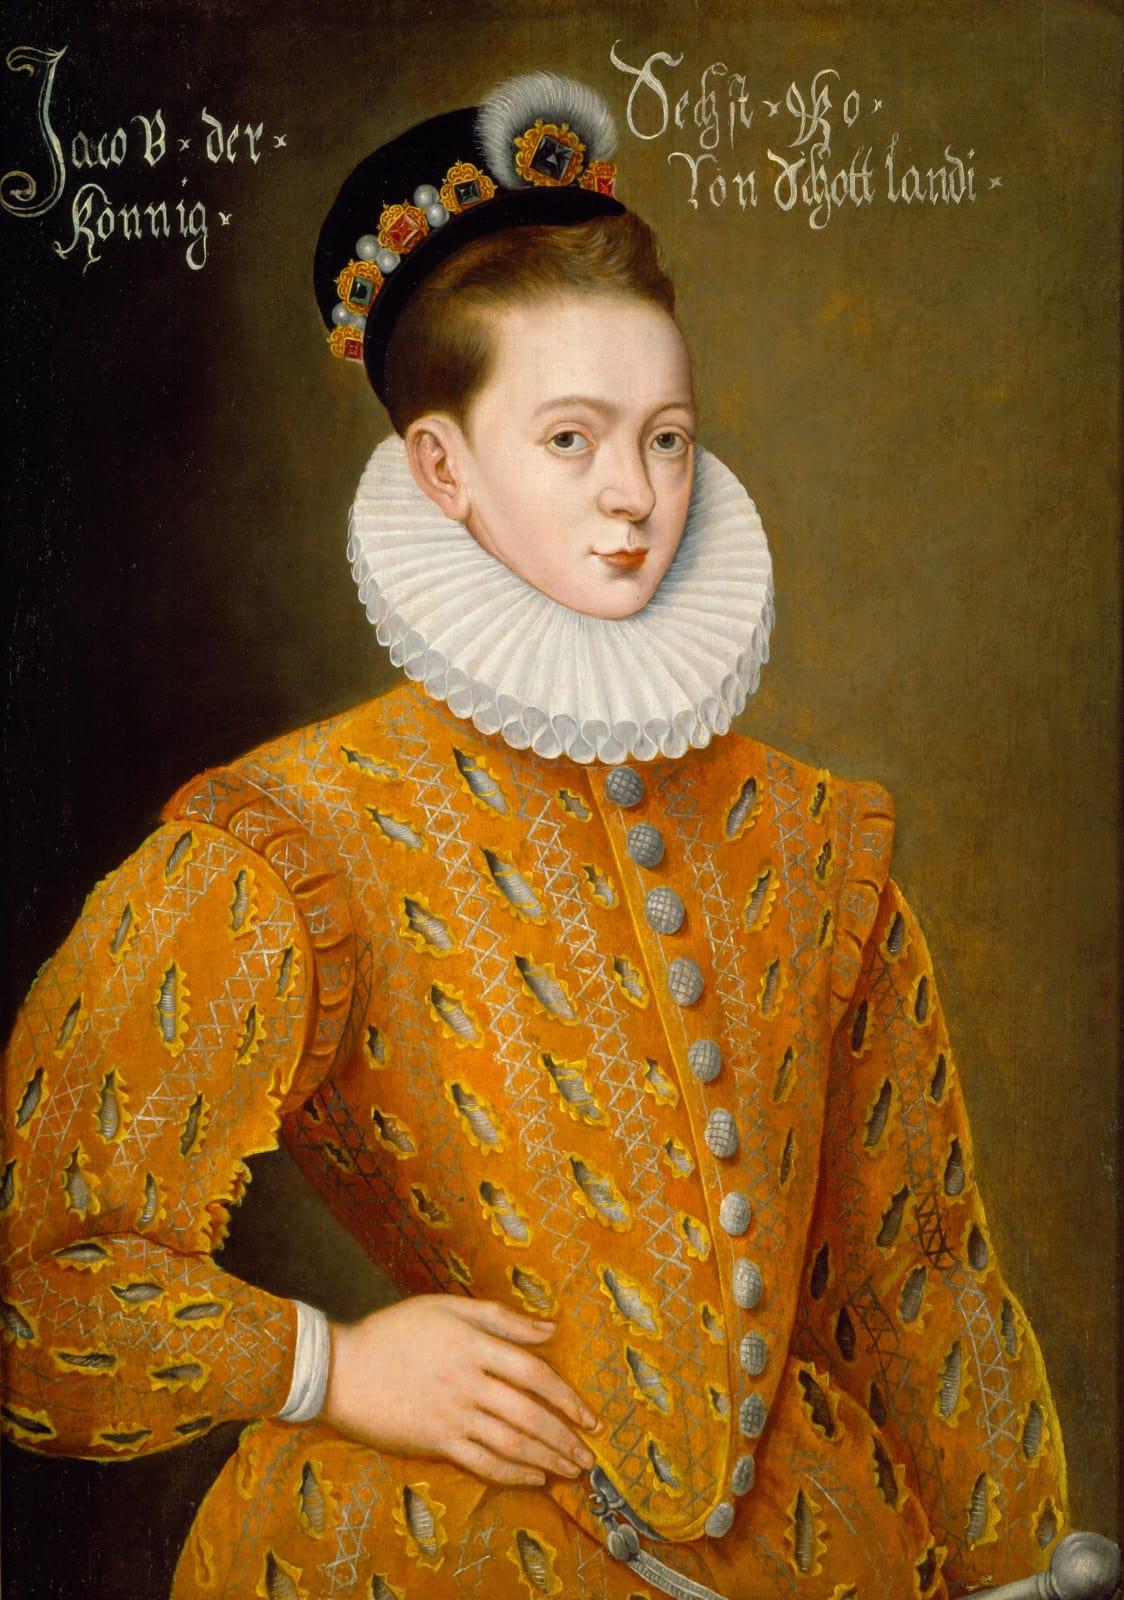 James VI of Scotland, and later I of England (1566 - 1625)